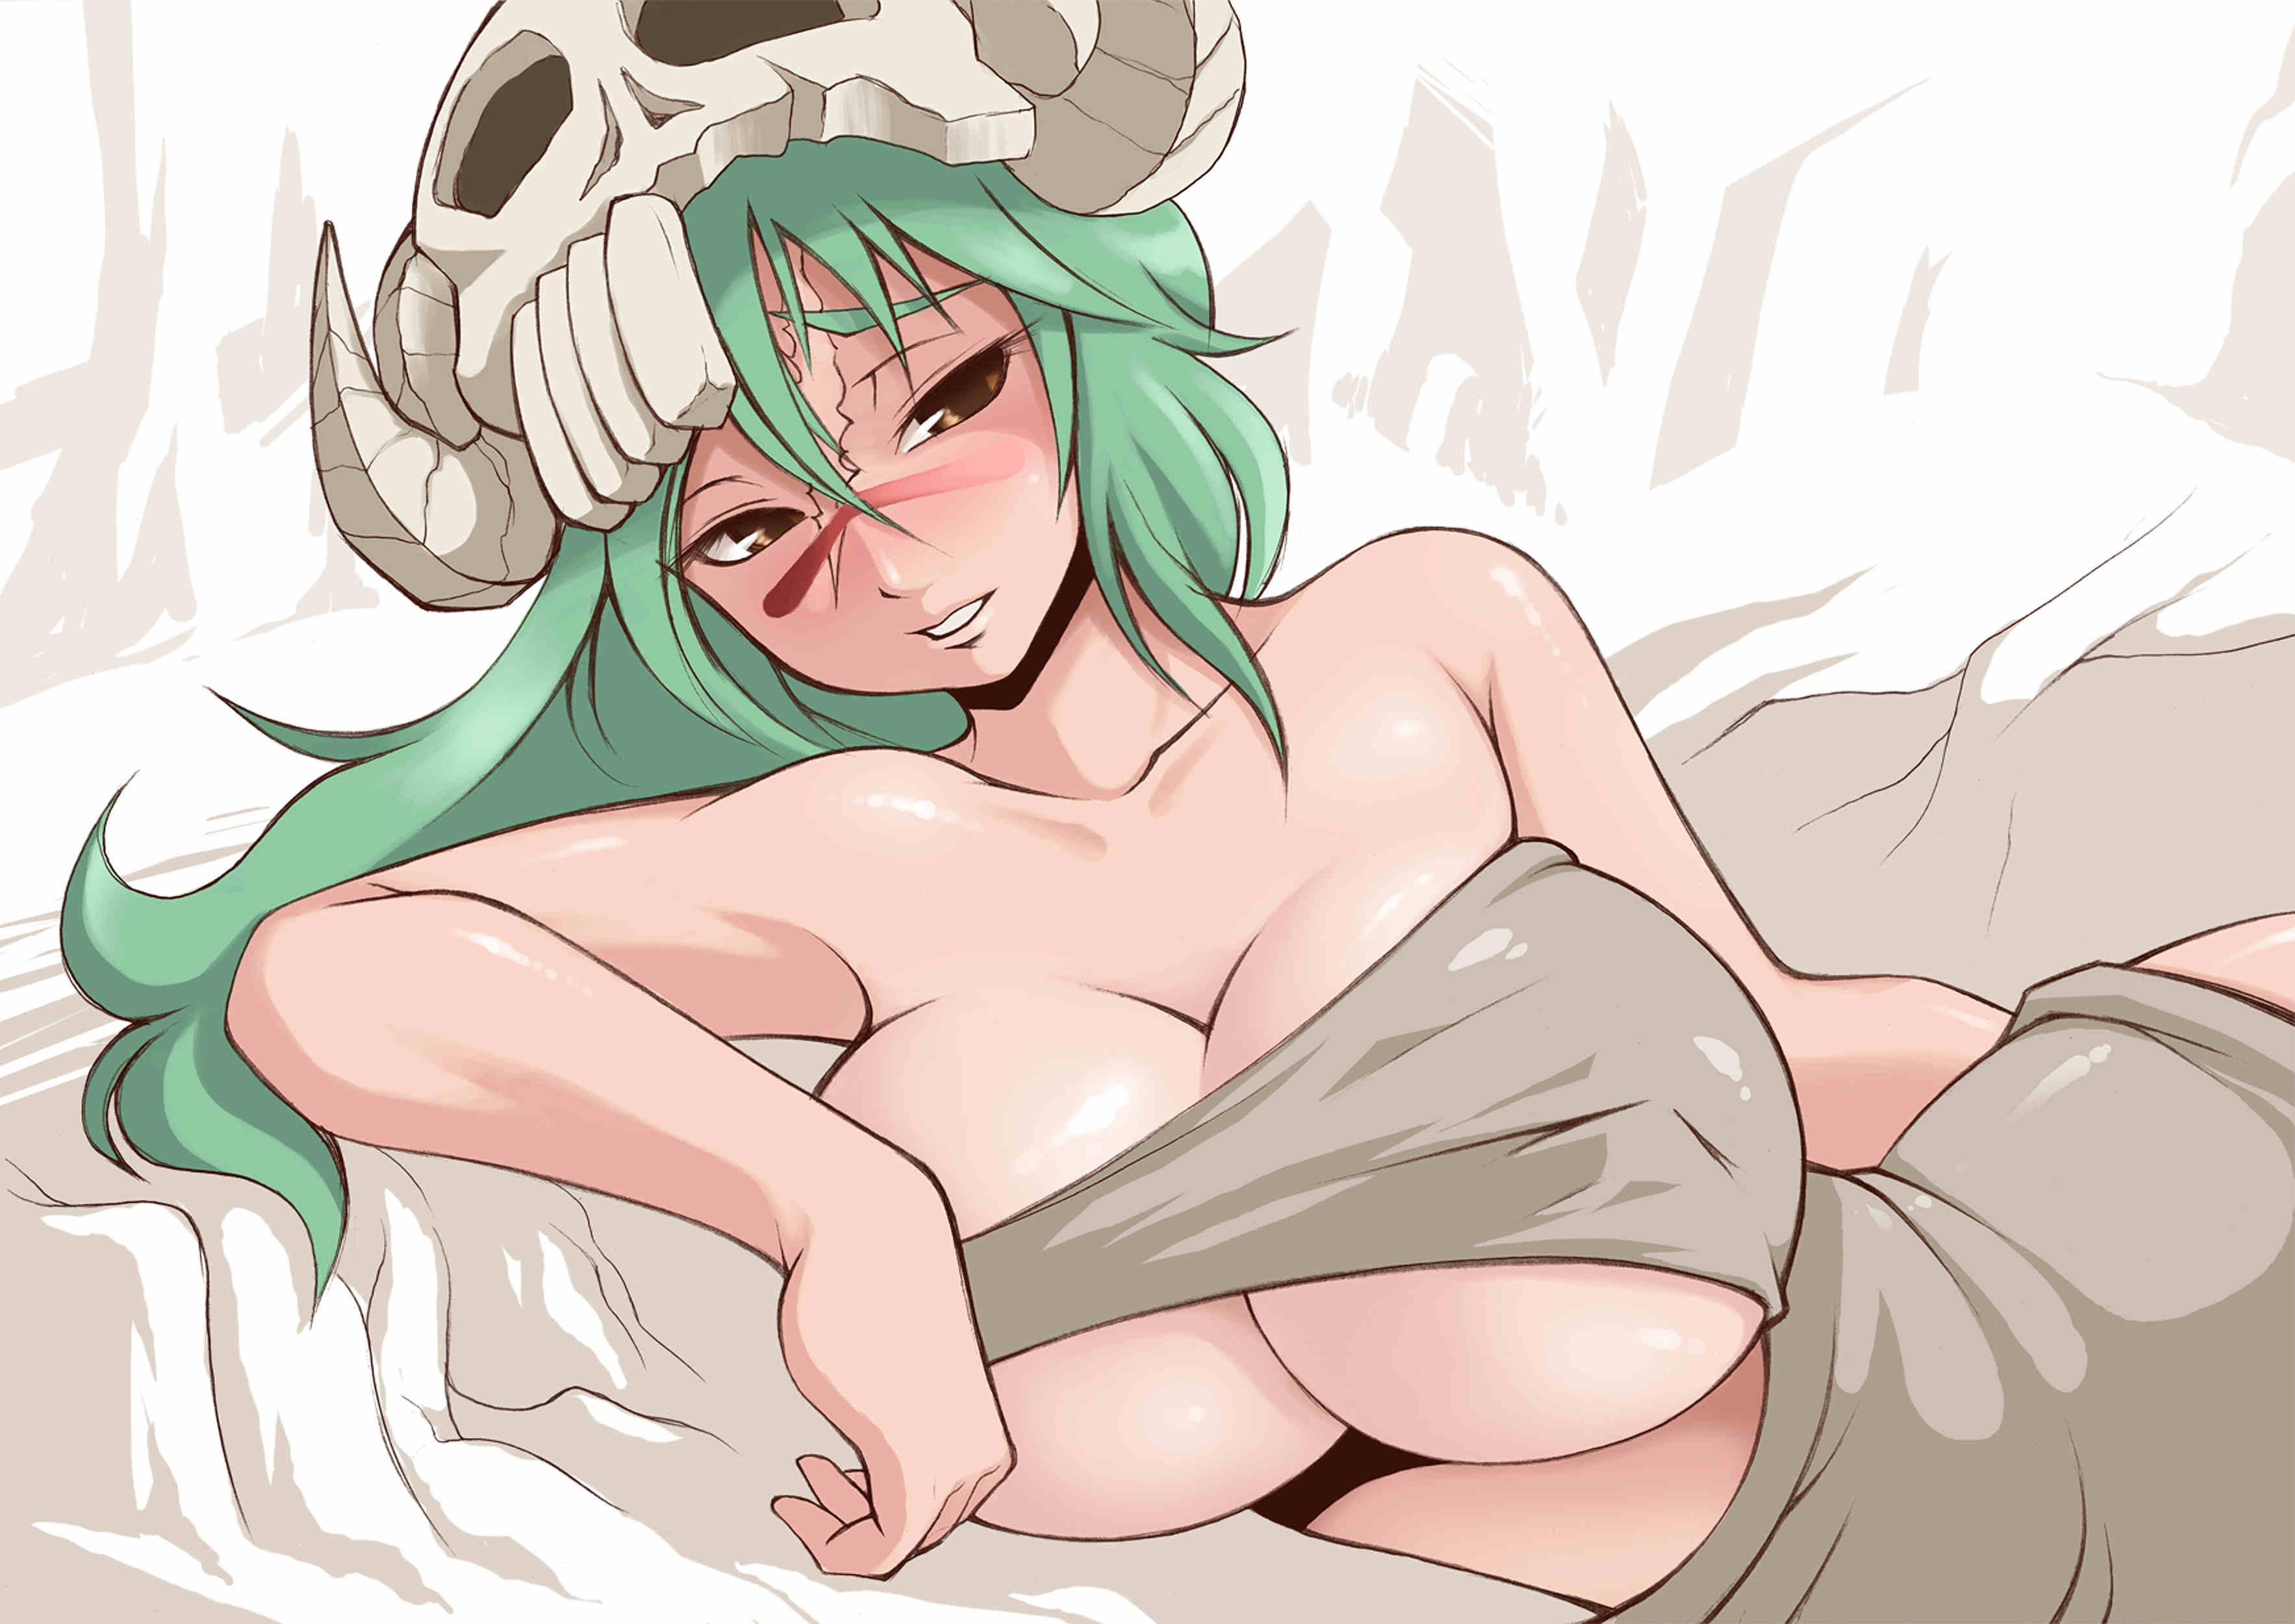 Anime 3533x2500 anime anime girls boobs Bleach big boobs green hair skull Nelliel Tu Odelschwanck